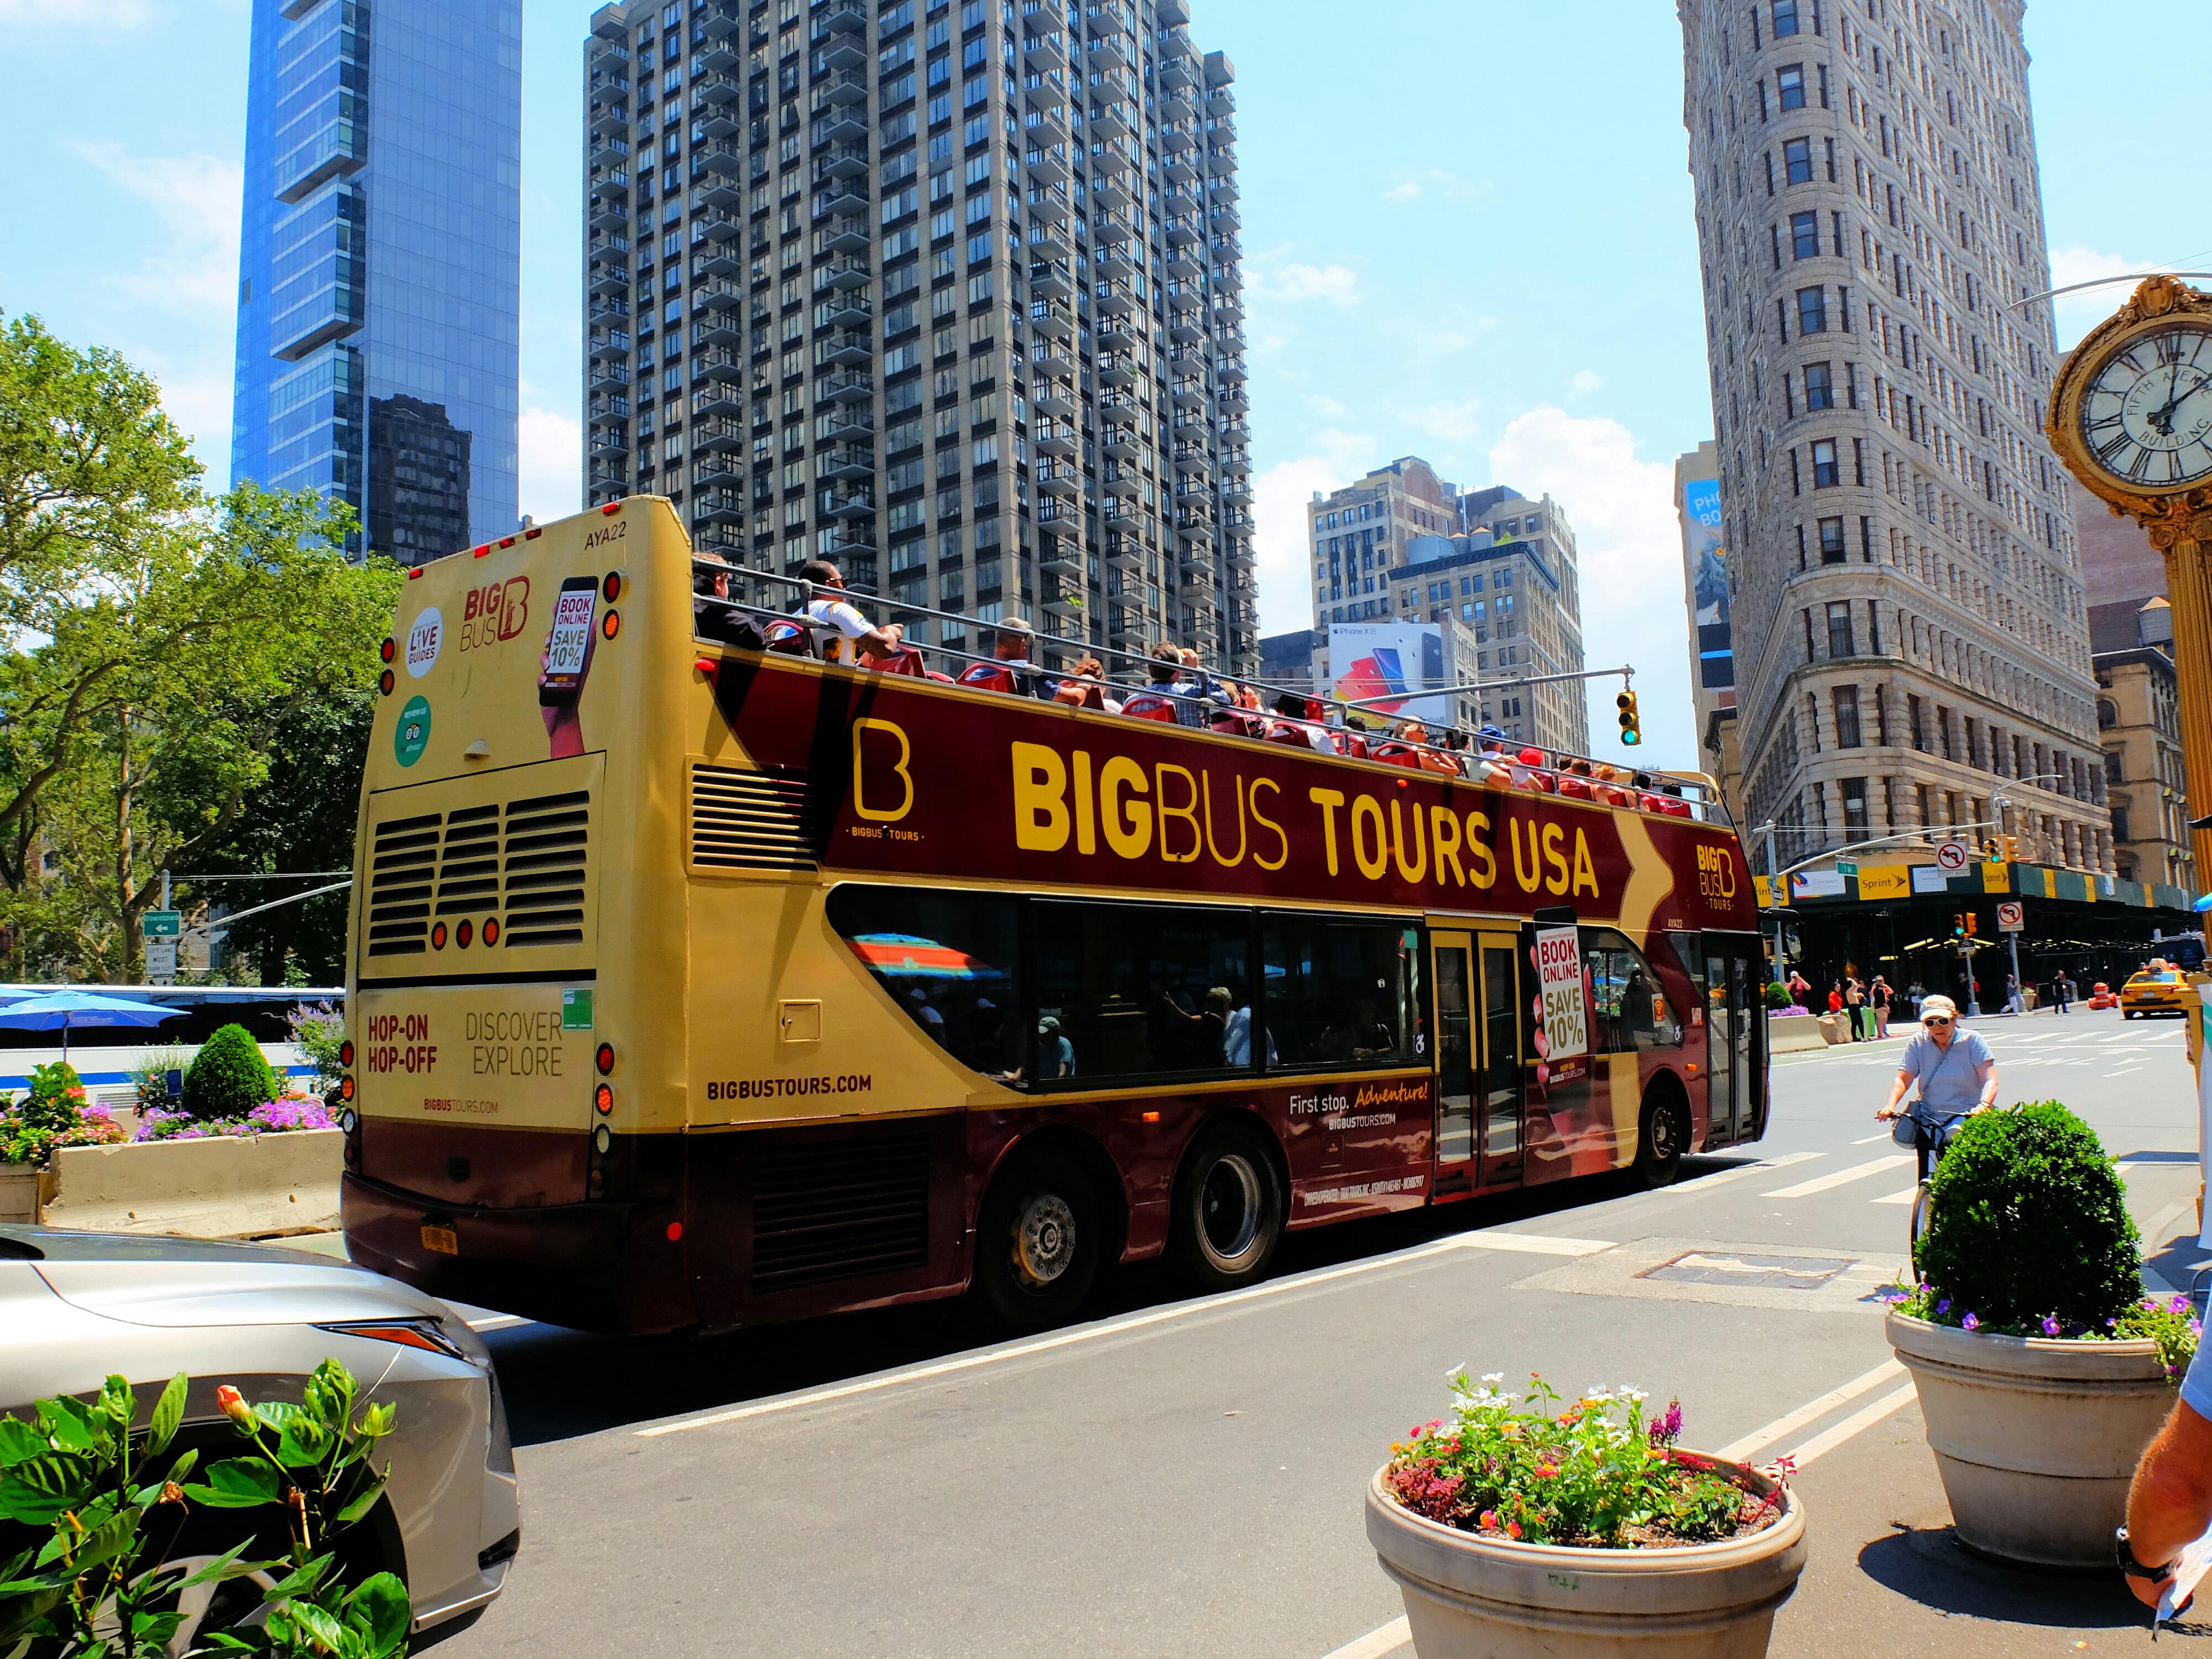 Big Bus Hop on Hop off Bus New York High Quality Wallpaper